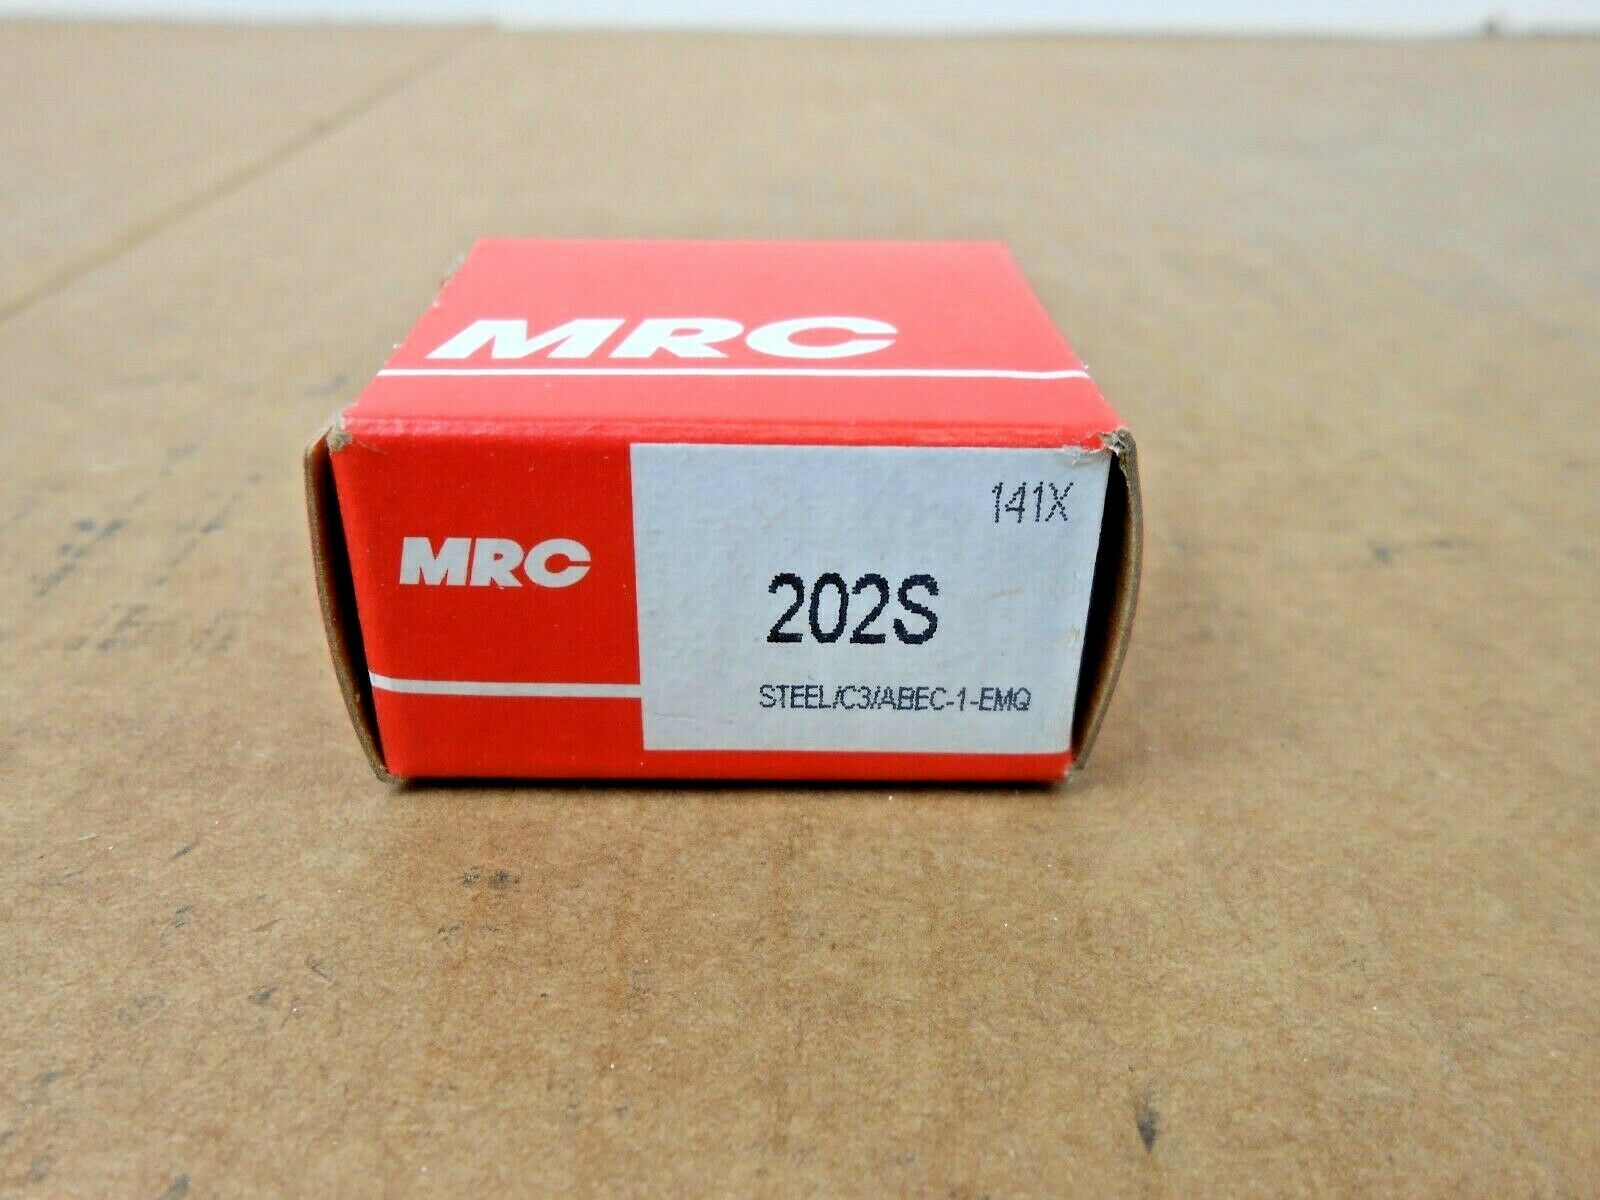 6 AVAIL 202S DEEP GROOVE BALL BEARING 15MM X 35MM X 11MM OPEN 1 NIB MRC SKF